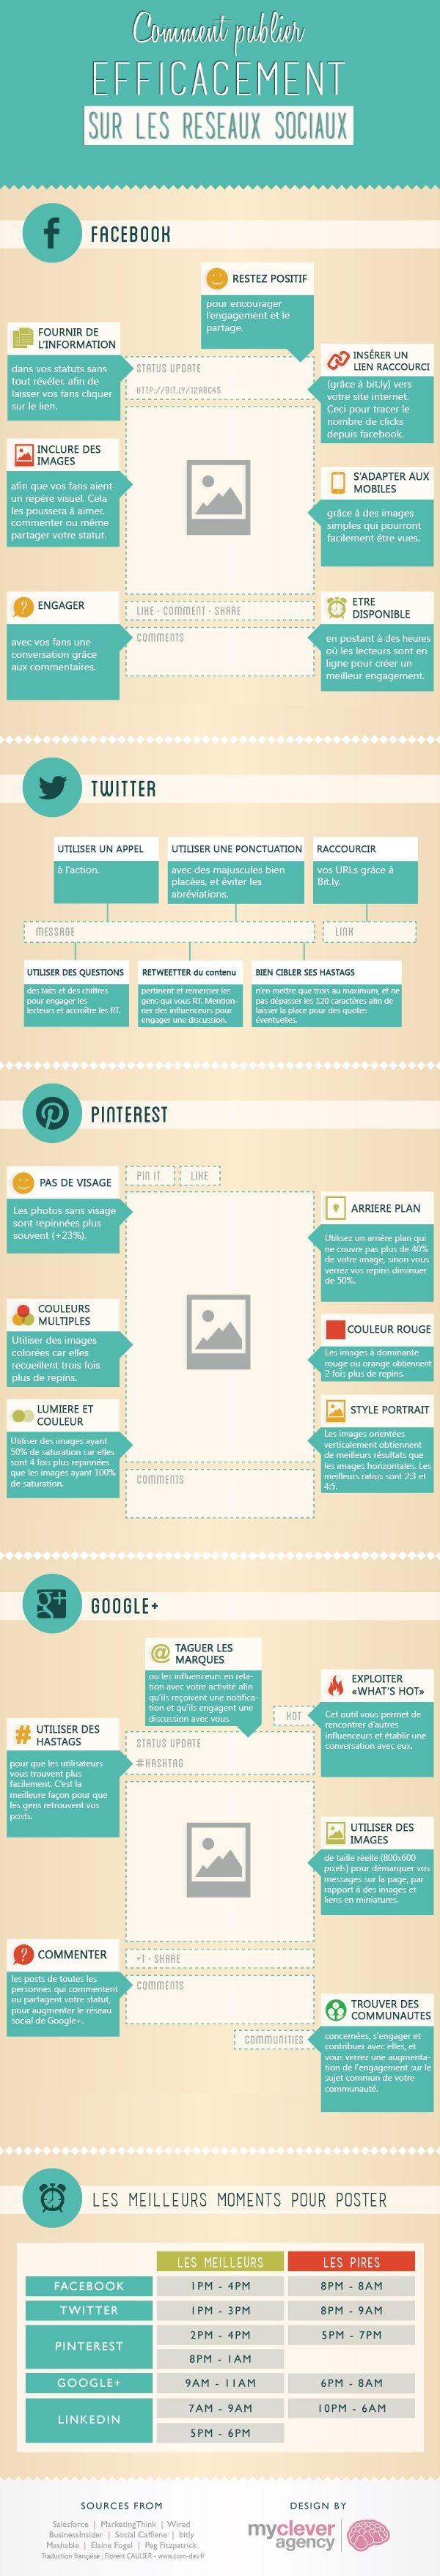 Publier efficacement sur #facebook #twitter #google+ #pinterest : http://com-dev.fr/?p=588